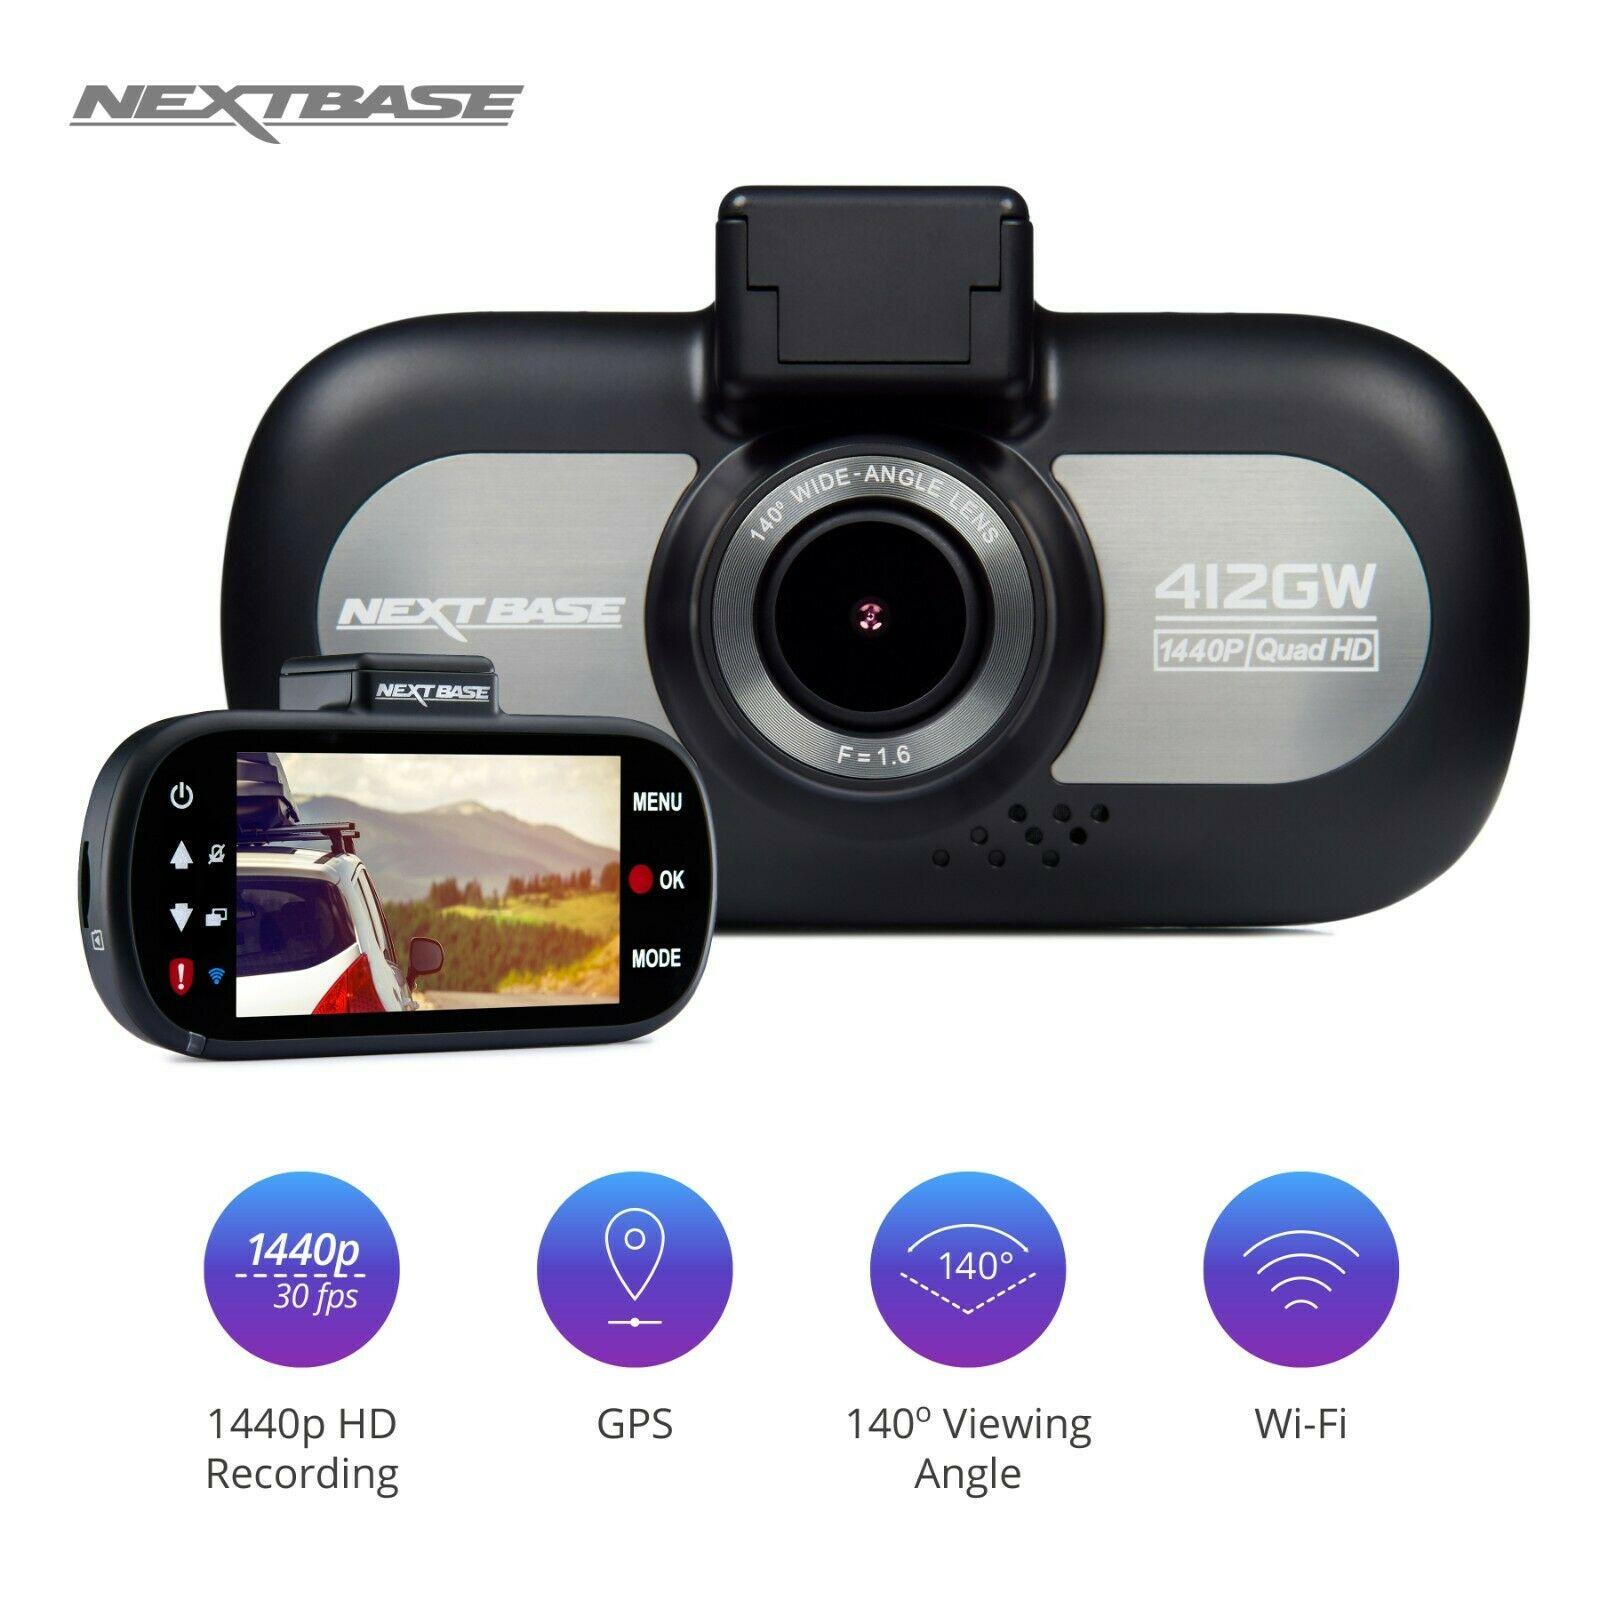 "Nextbase 412GW Dash Cam 3"" LED Car Recorder Night Vision GPS Wi-Fi - £69.95 delivered @ velocityelectronics / eBay"